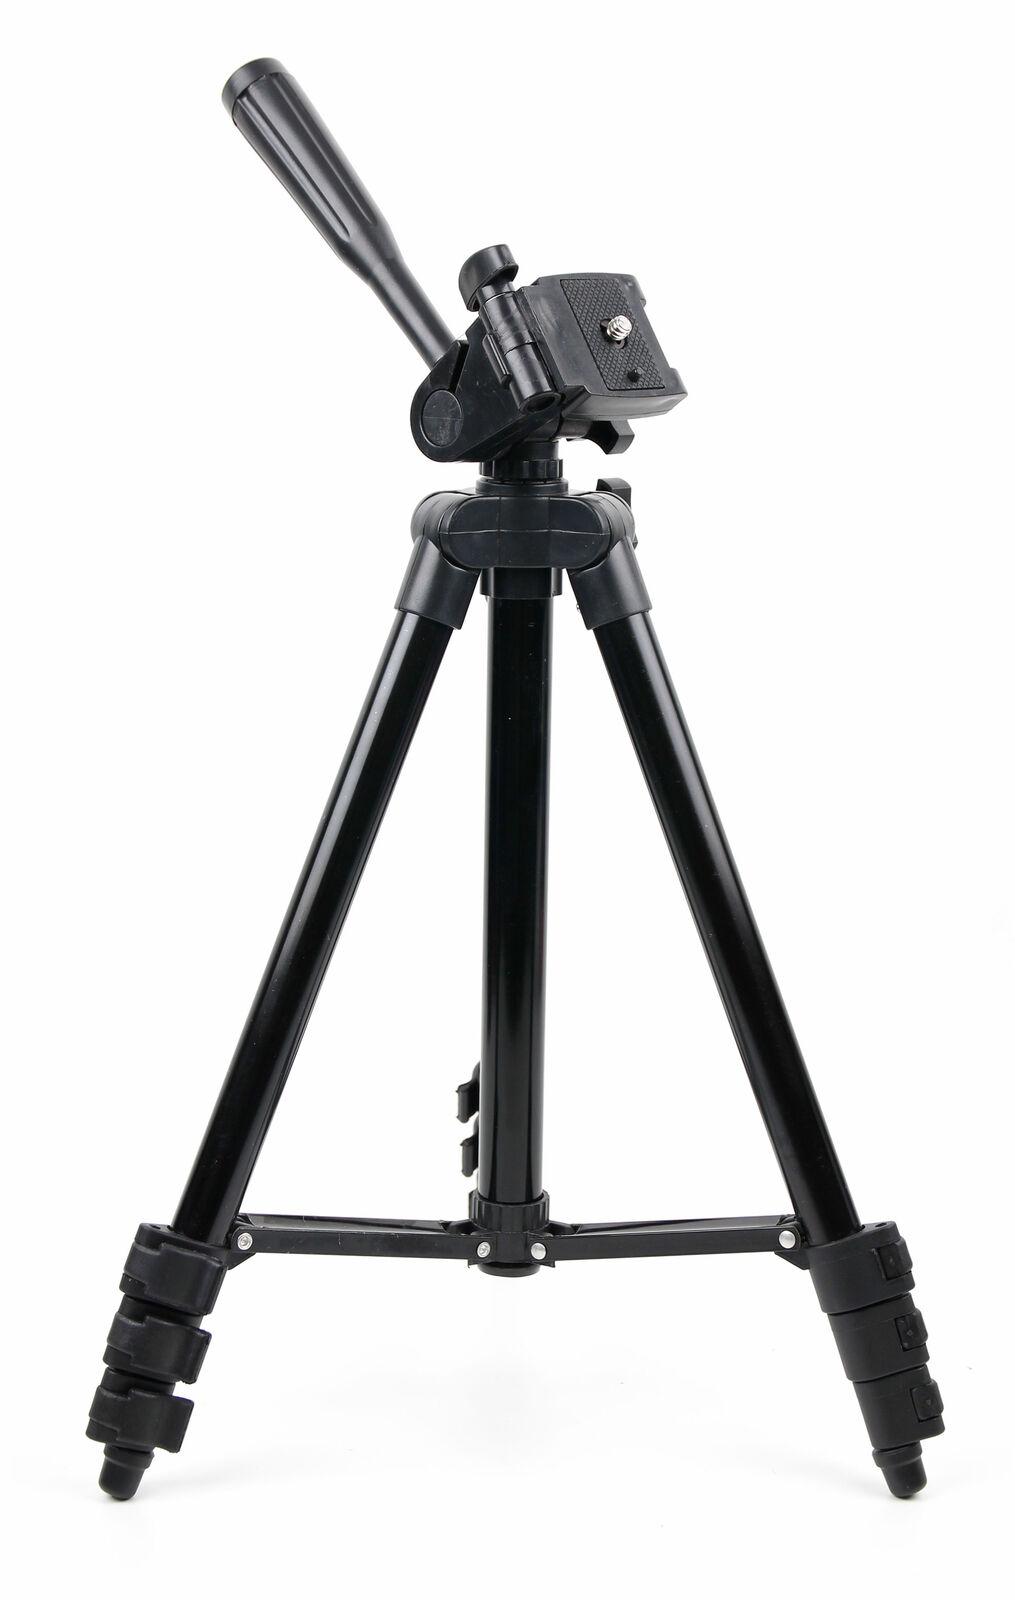 1M Extendable Tripod W// Mount For Canon 5D Mark IV M5 EOS Mark IV Nikon D3400